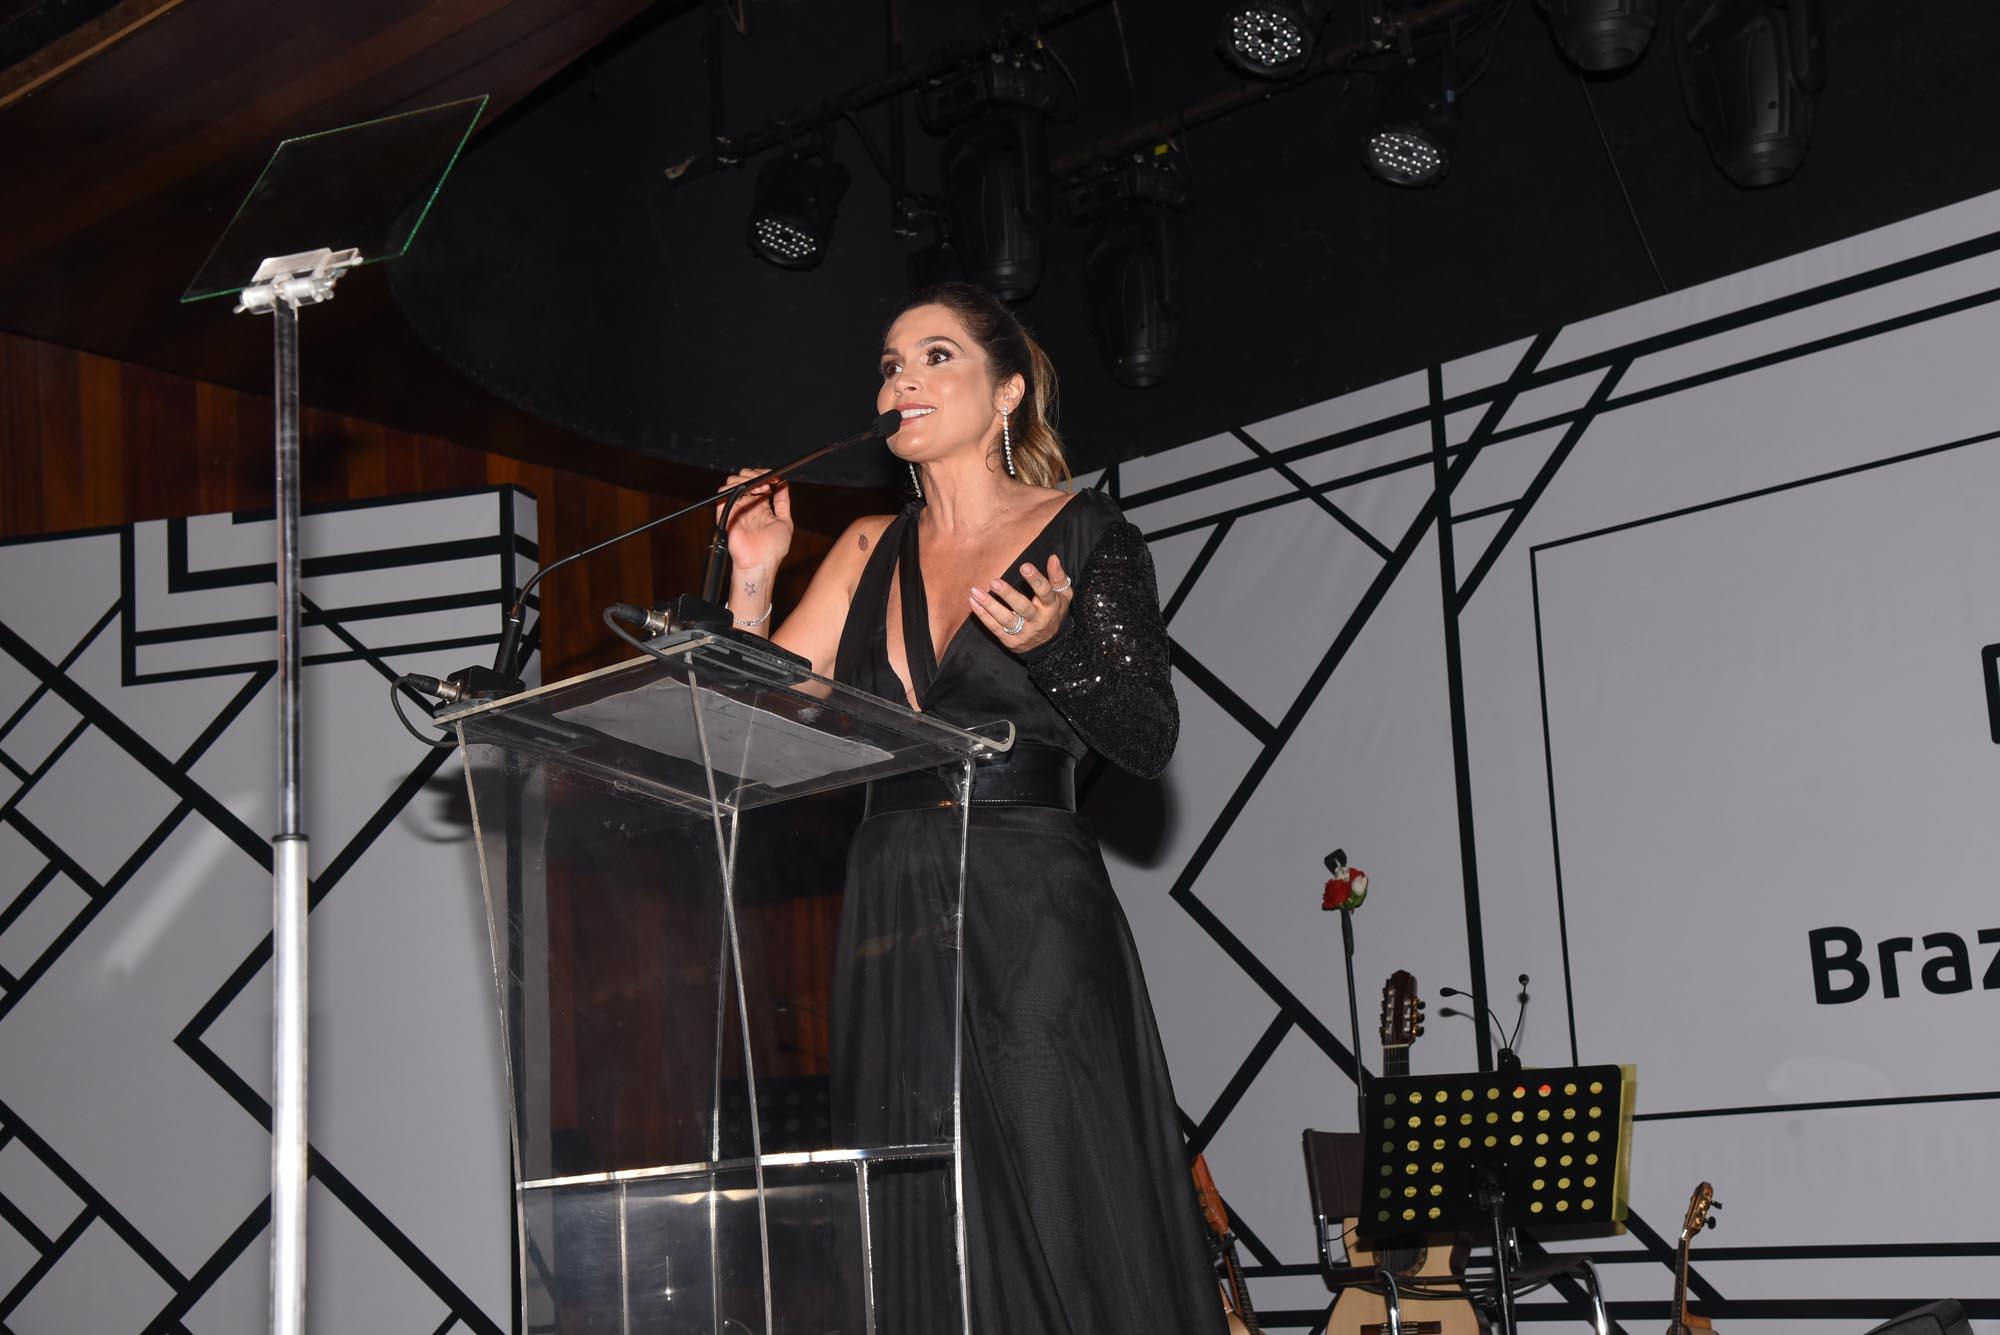 Flavia Alessandra V BrazilFoundation Gala São Paulo Chanel 2018 Filantropia Brasil Philanthropy Brazil